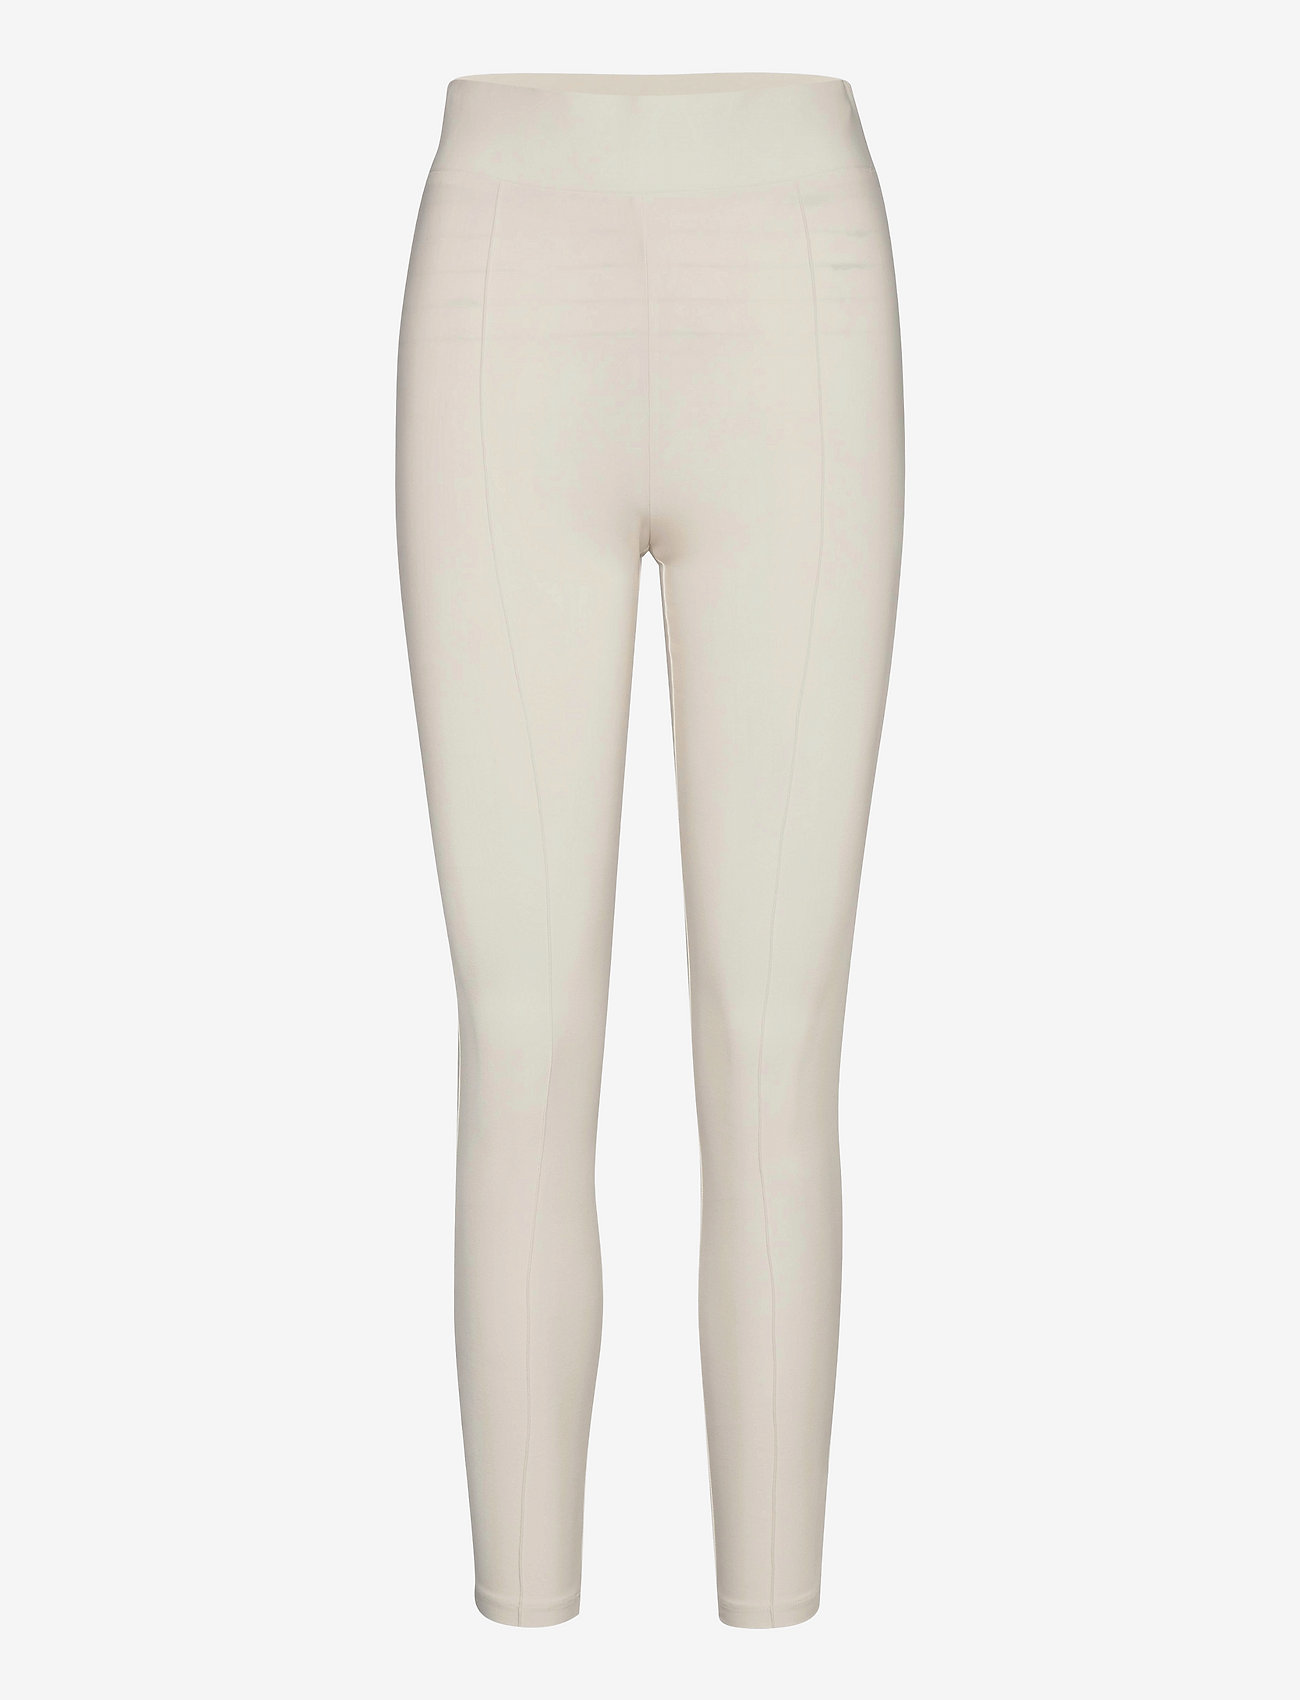 Max Mara Leisure - BAHAMAS - leggings - white - 0